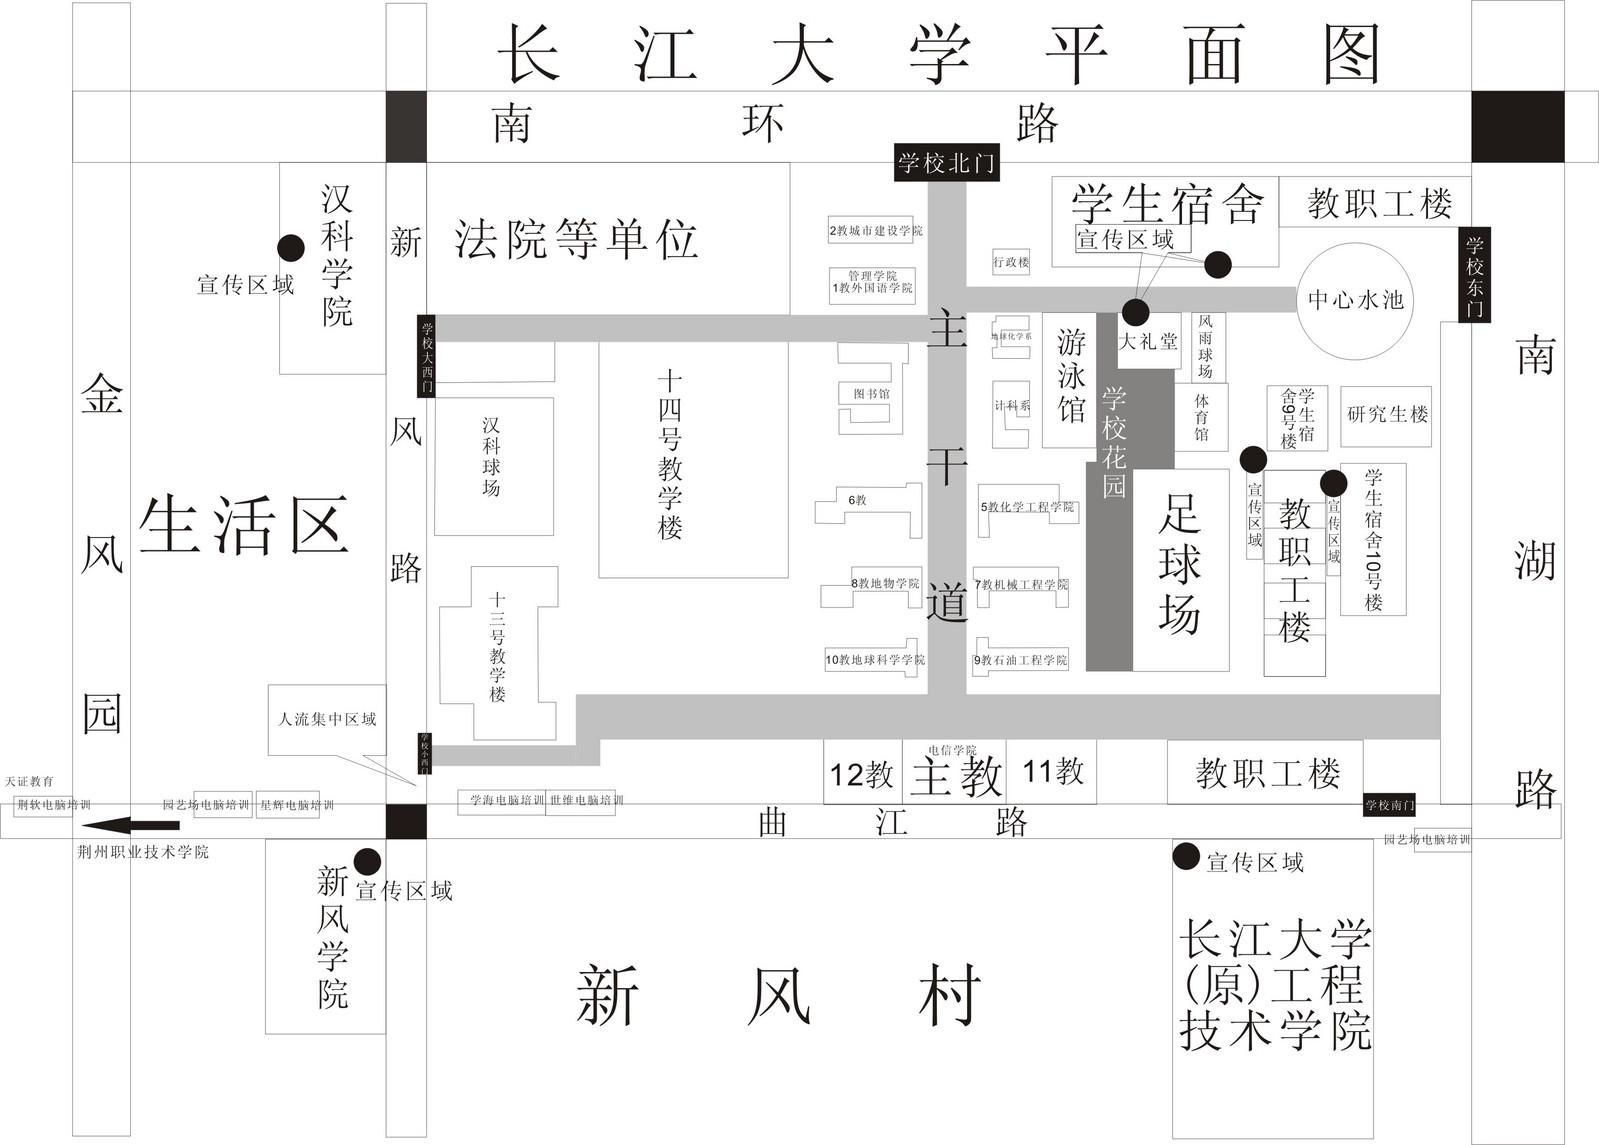 X4 >> 人工绘制 长江大学东校区平面图_电子爱好者-奇鹏_百度空间